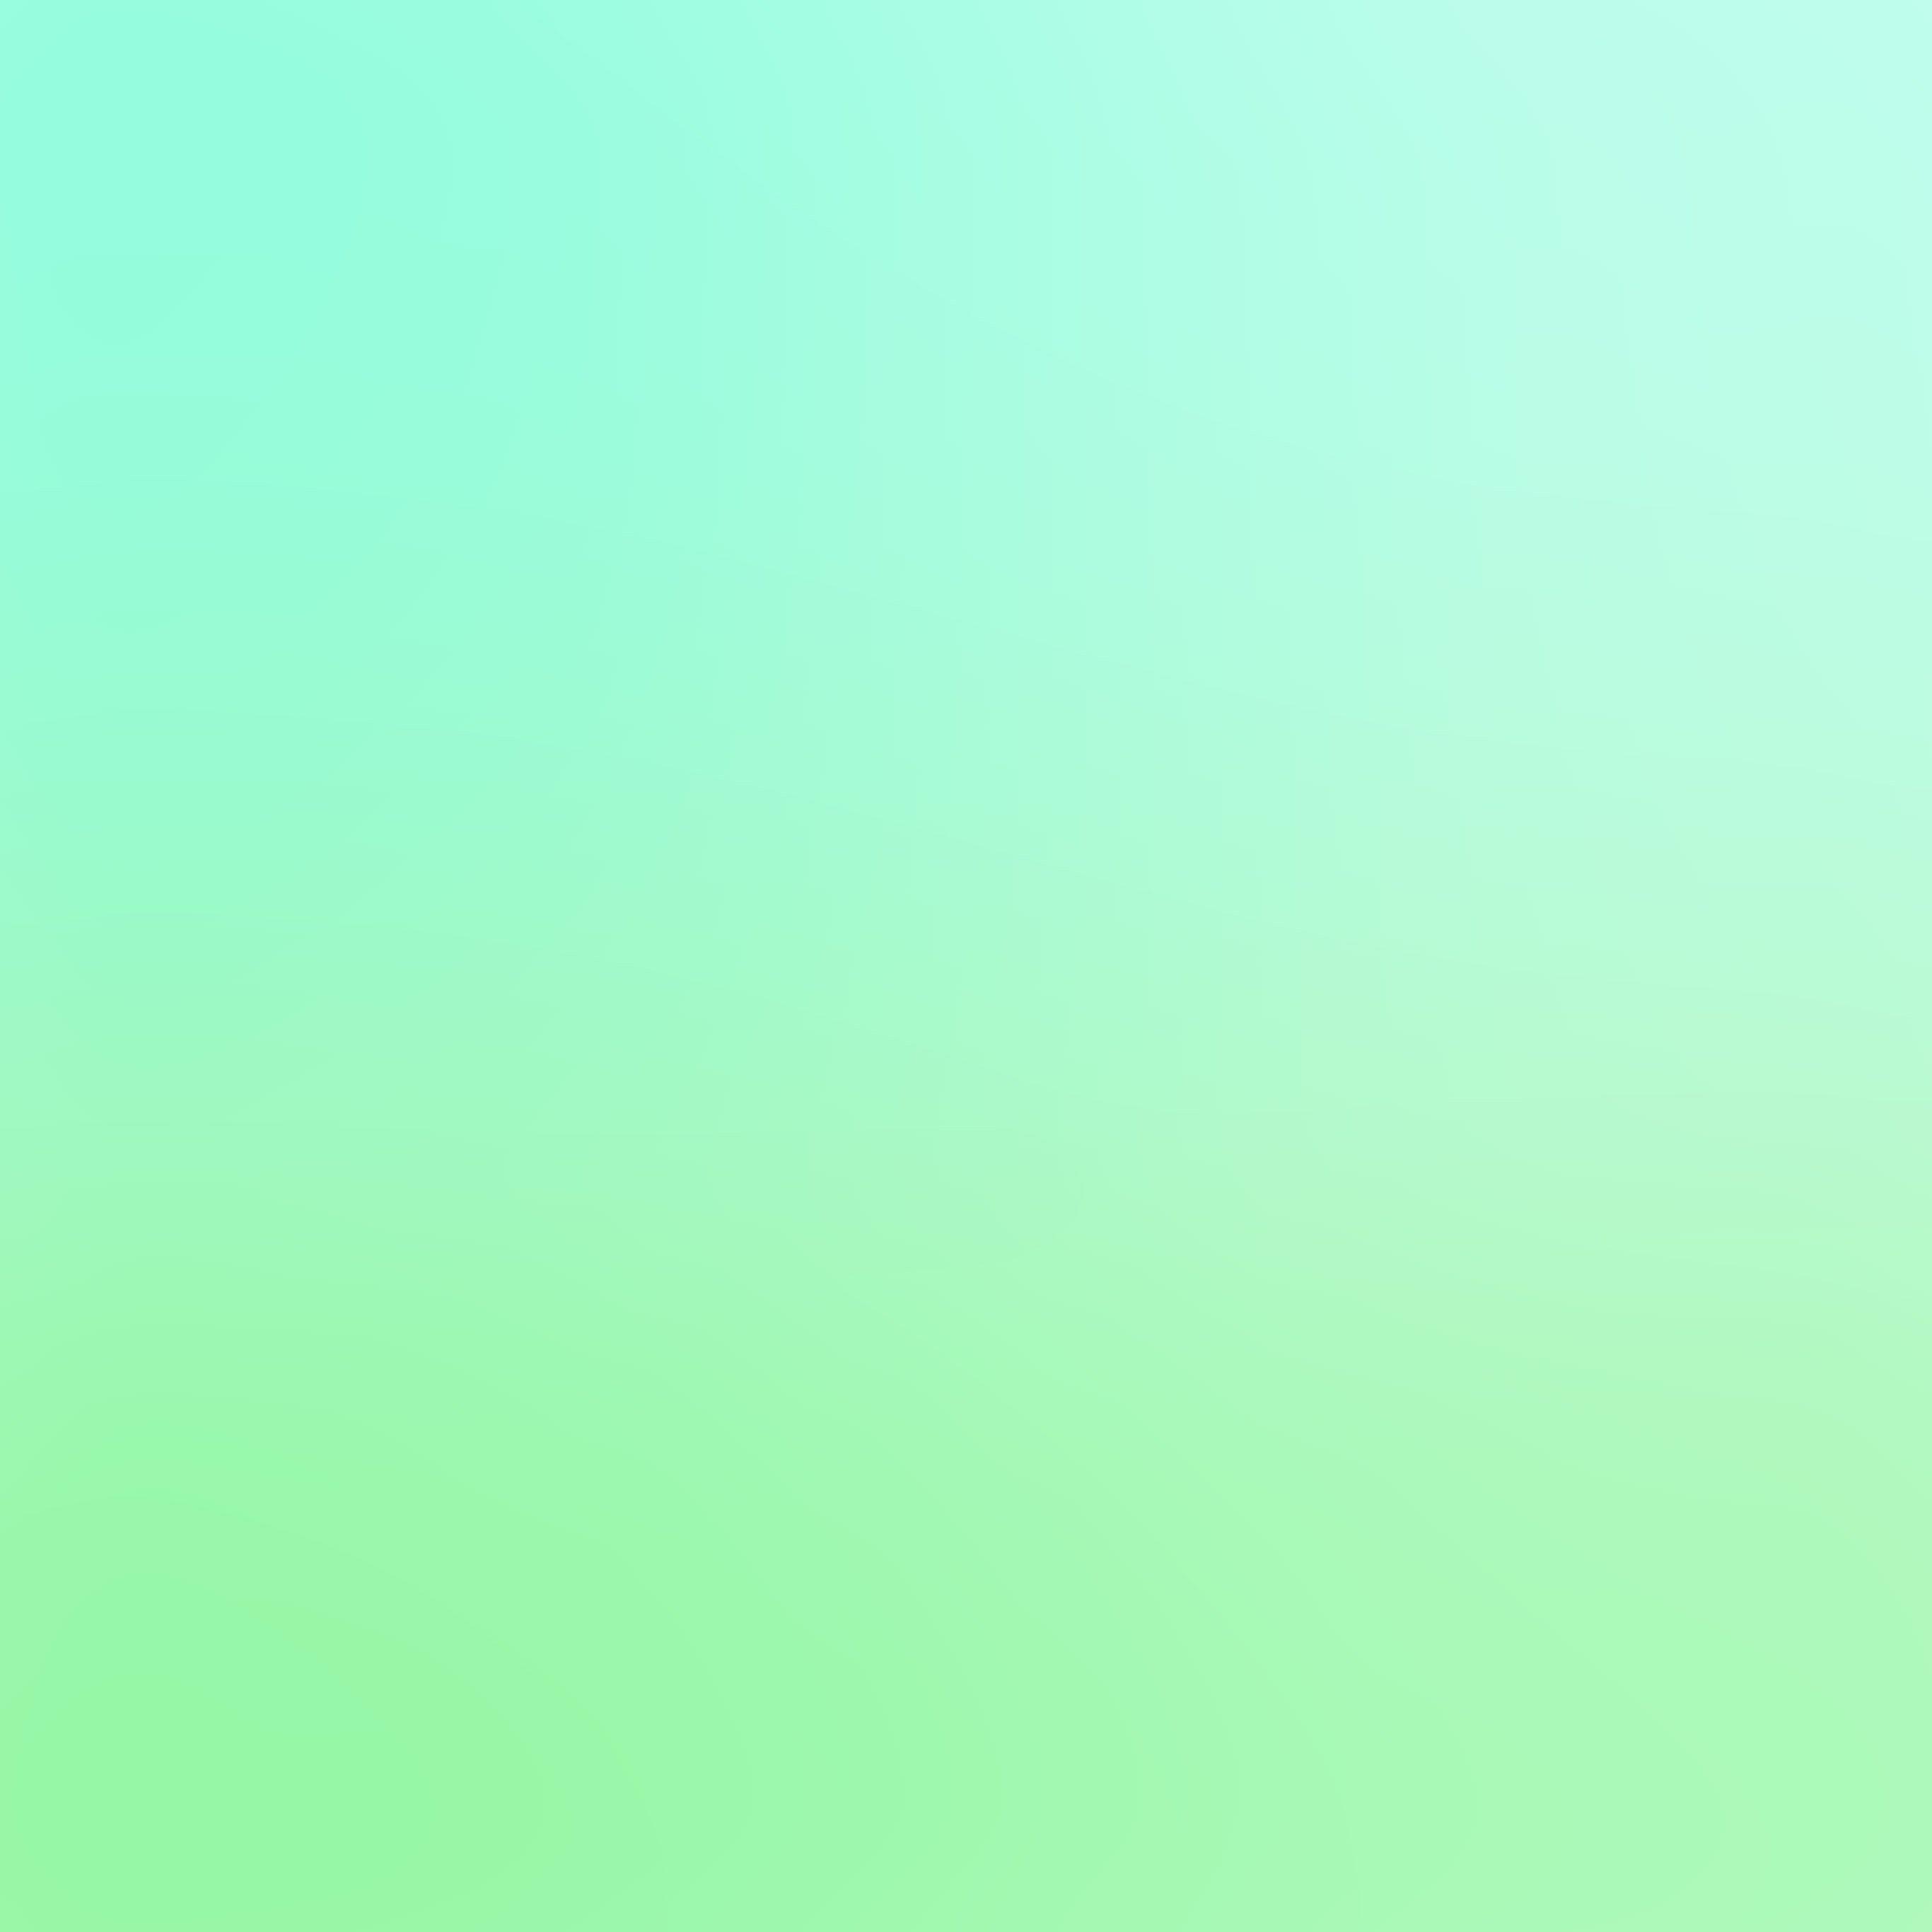 Pastel Mint Green Background - HD Wallpaper